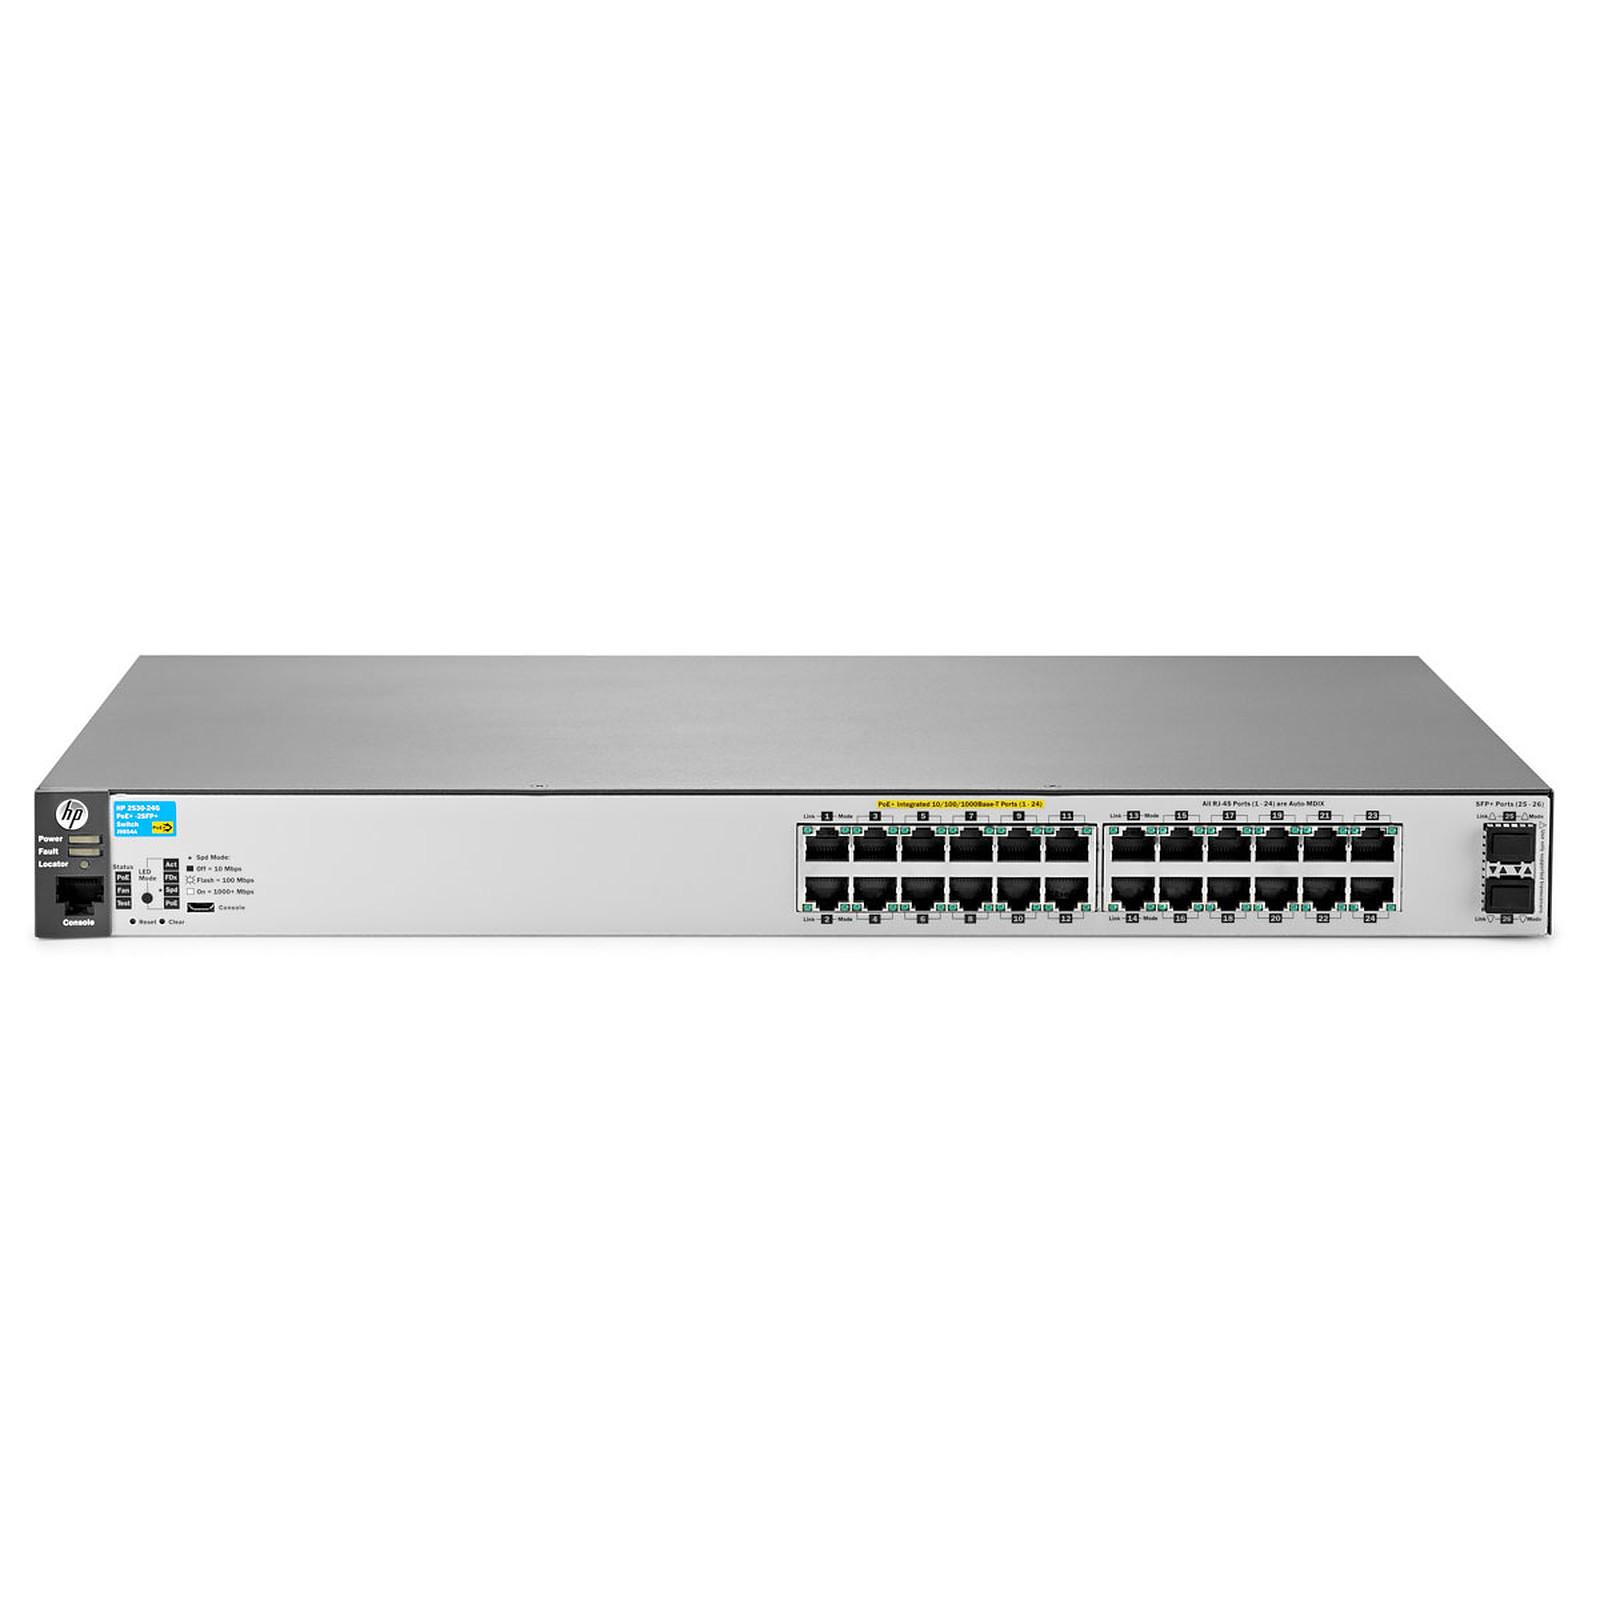 HPE Aruba 2530-24G-PoE+ avec 2 ports SFP+